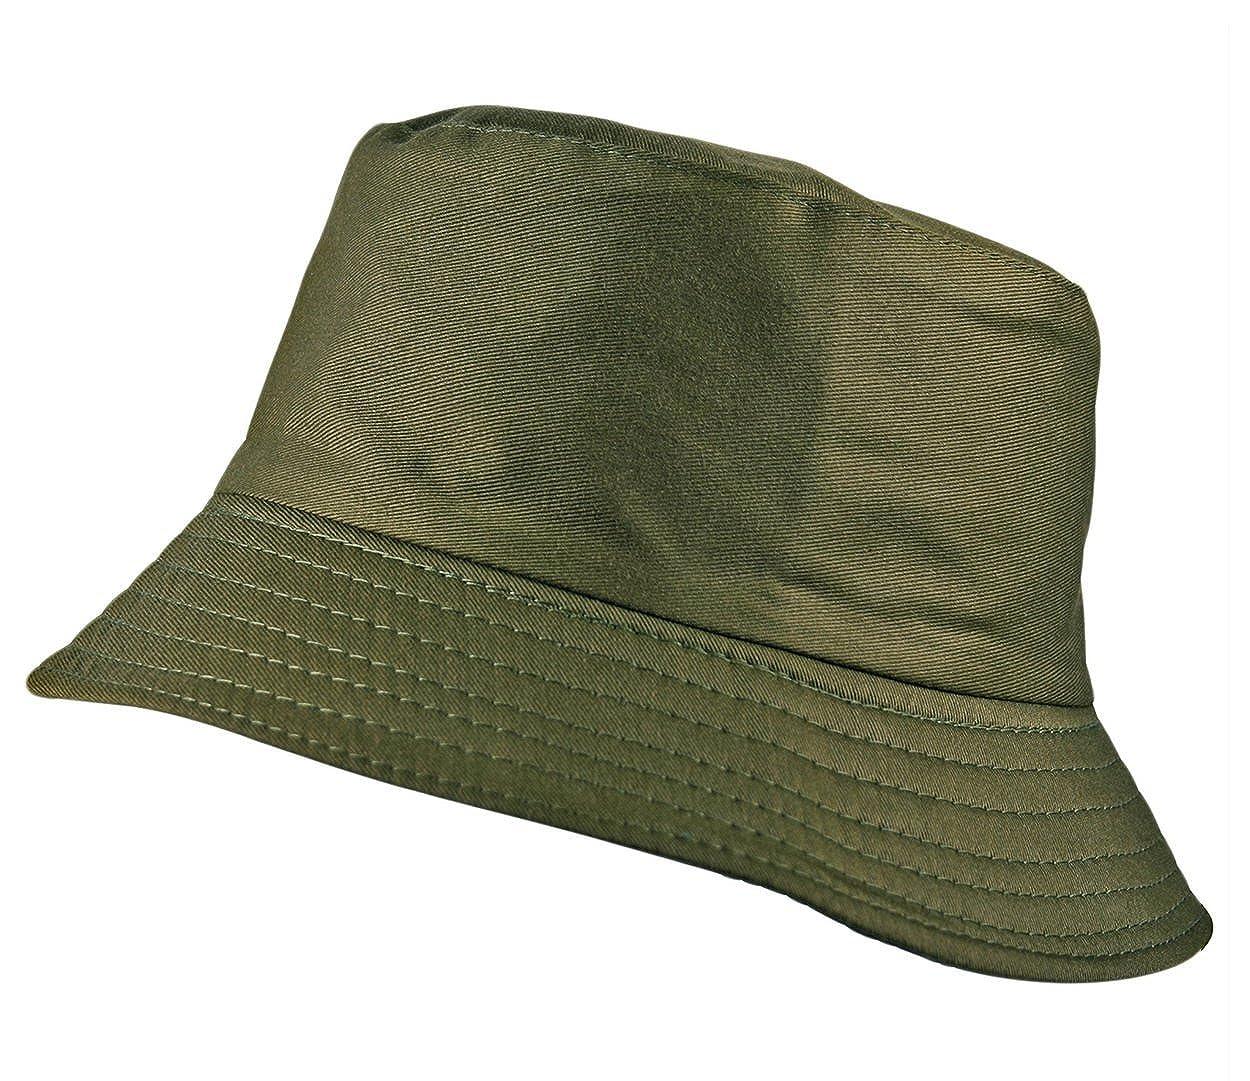 Itzu Classic Bucket Bush Hat Plain Adult Unisex in Grey  Amazon.co.uk   Clothing 3f5f9bad2aa4